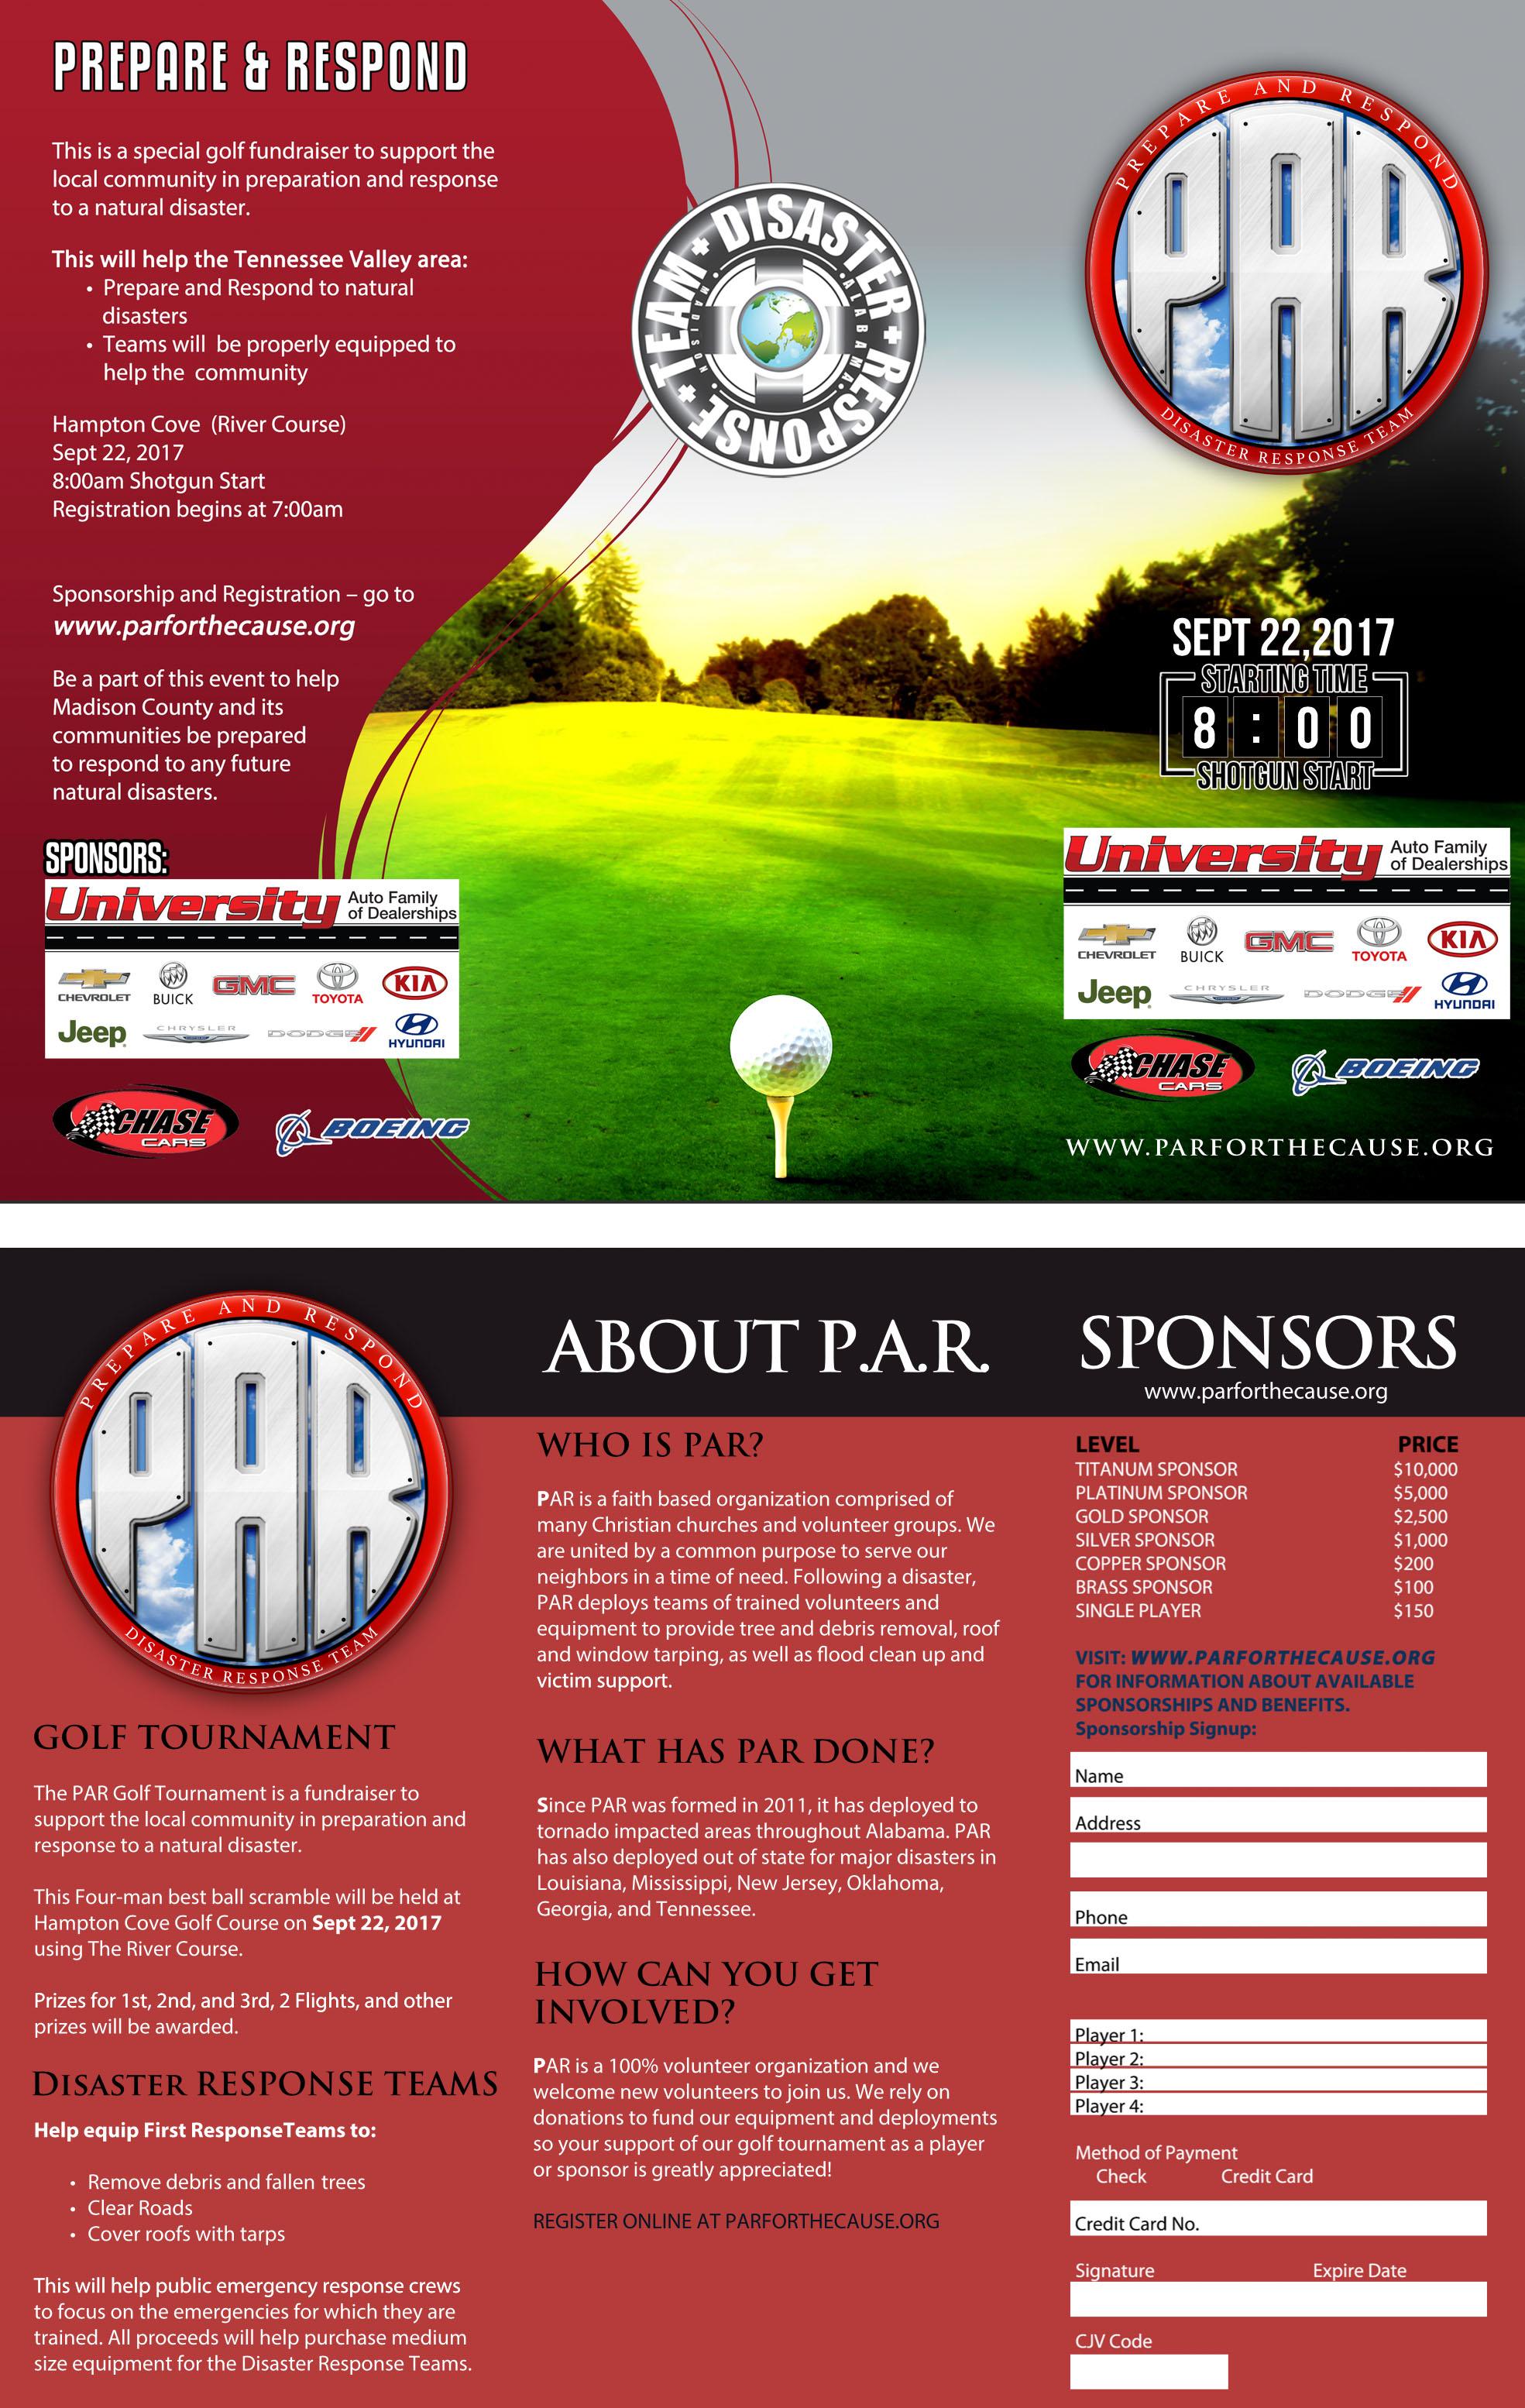 2017 PAR Golf Tournament